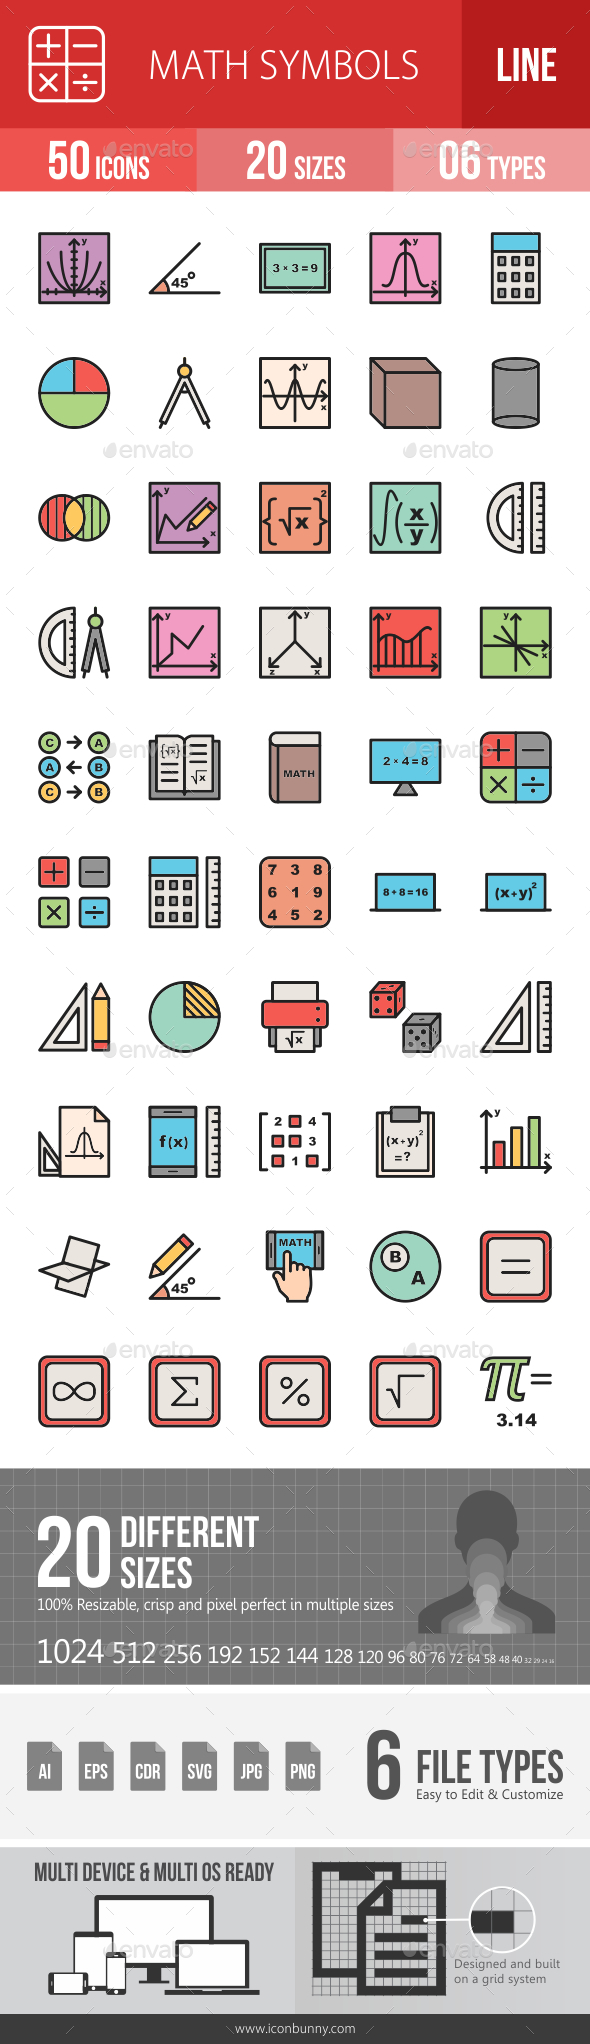 Math Symbols Line Filled Icons - Icons